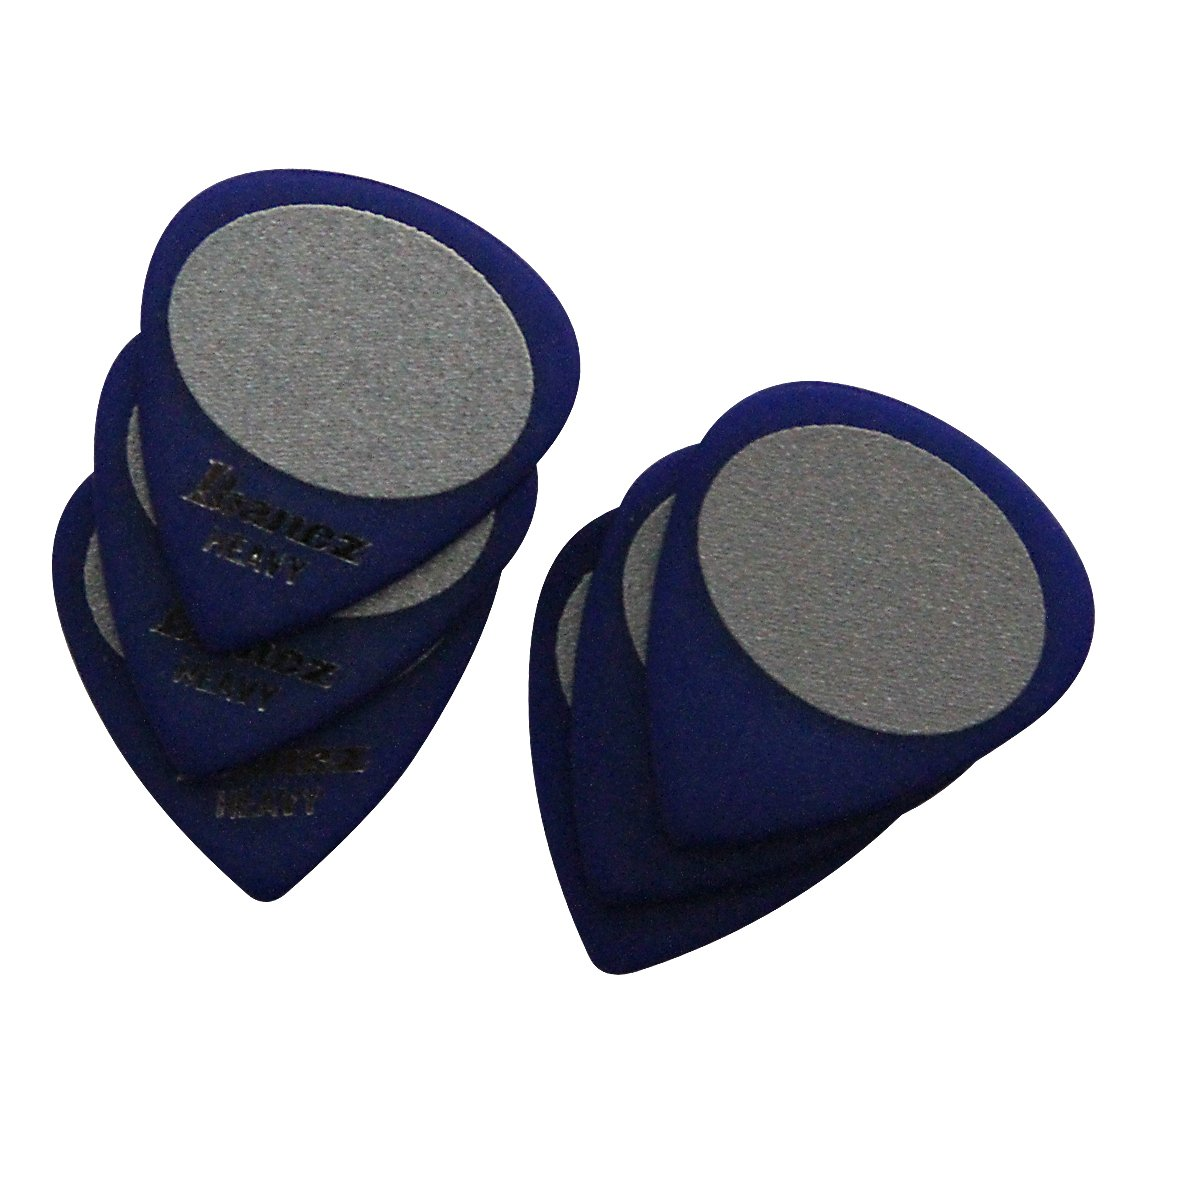 Ibanez BPA16HS-BL Grip Wizard Serie - Plektren Sandgrip Heavy (6 Stück) blau